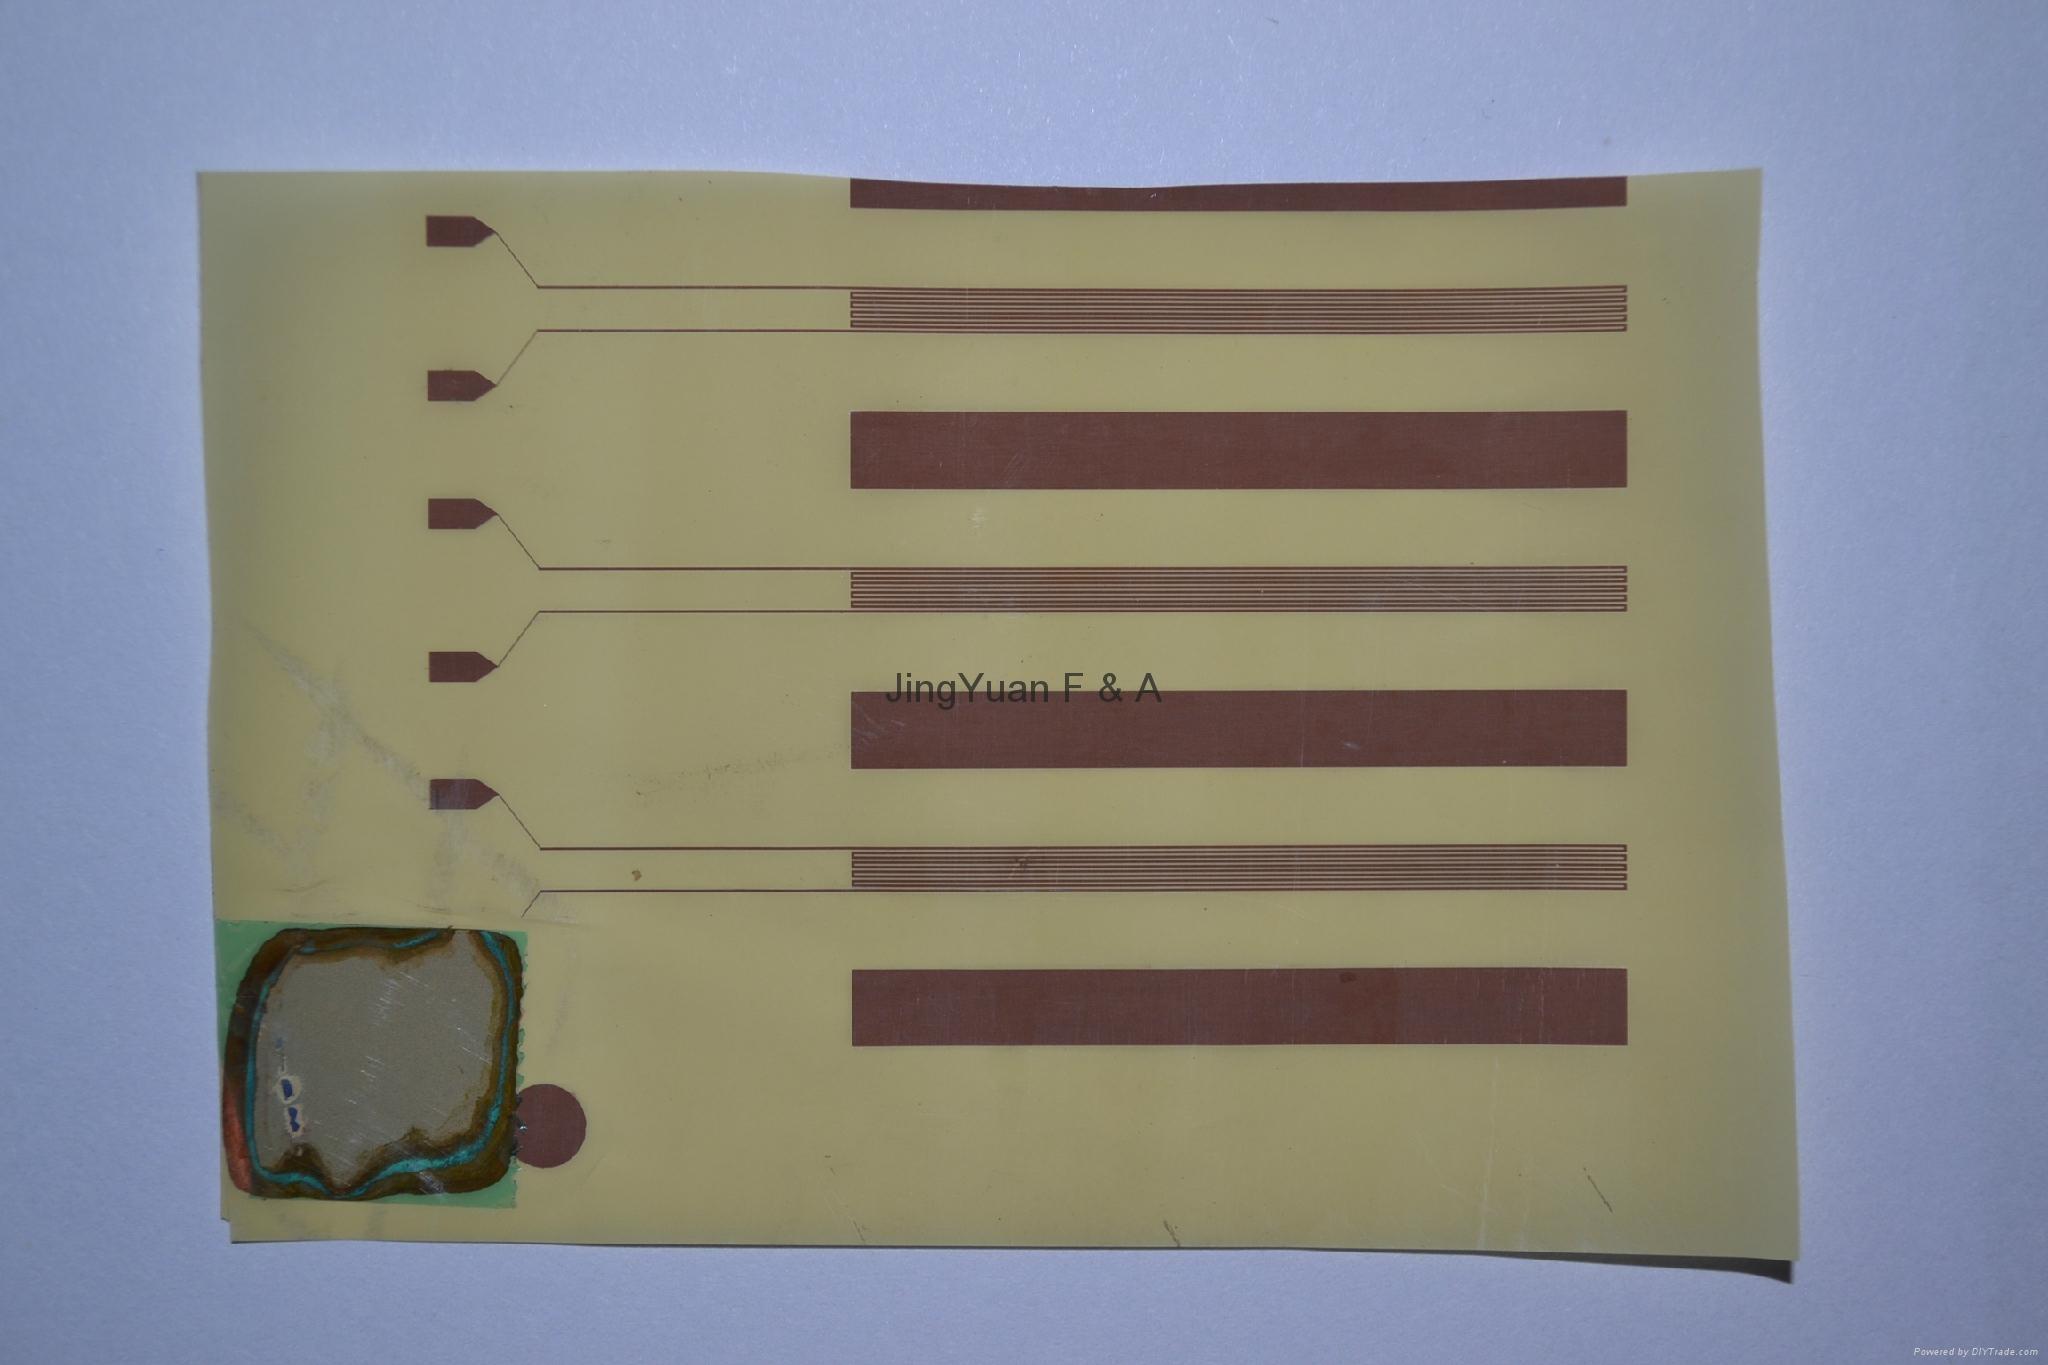 FPC(柔性電路板)180° 耐死折測試機 1